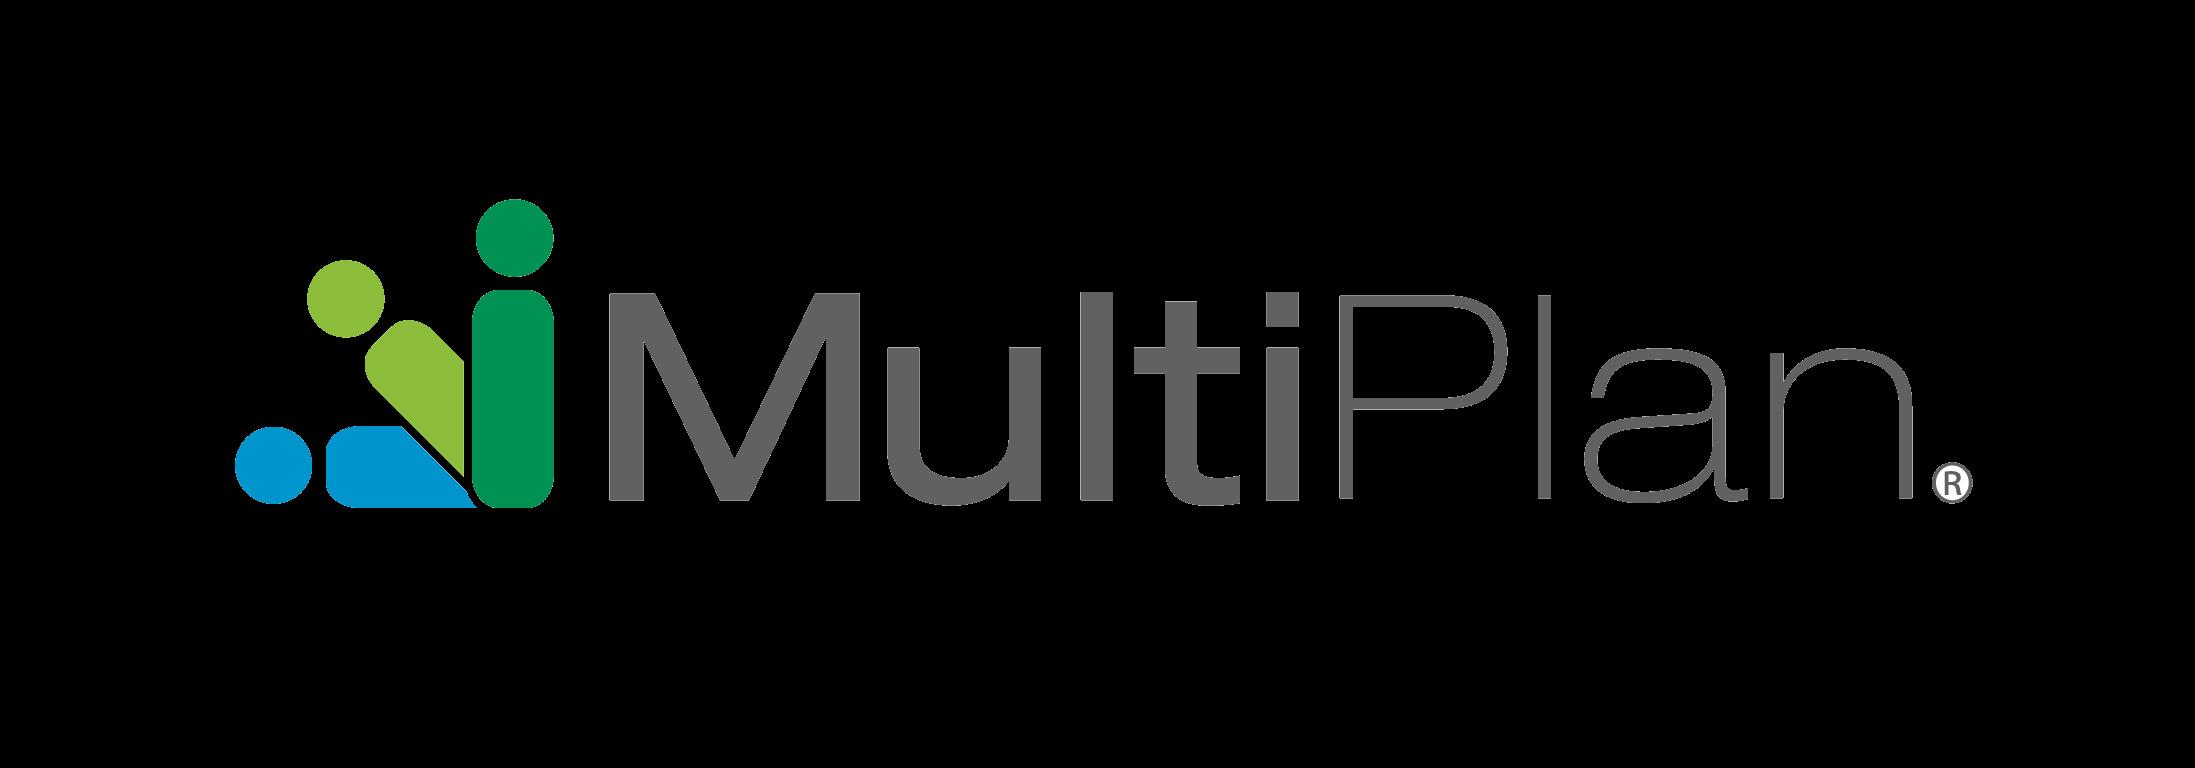 MULTIPLAN_LOGO_CMYKtrans.